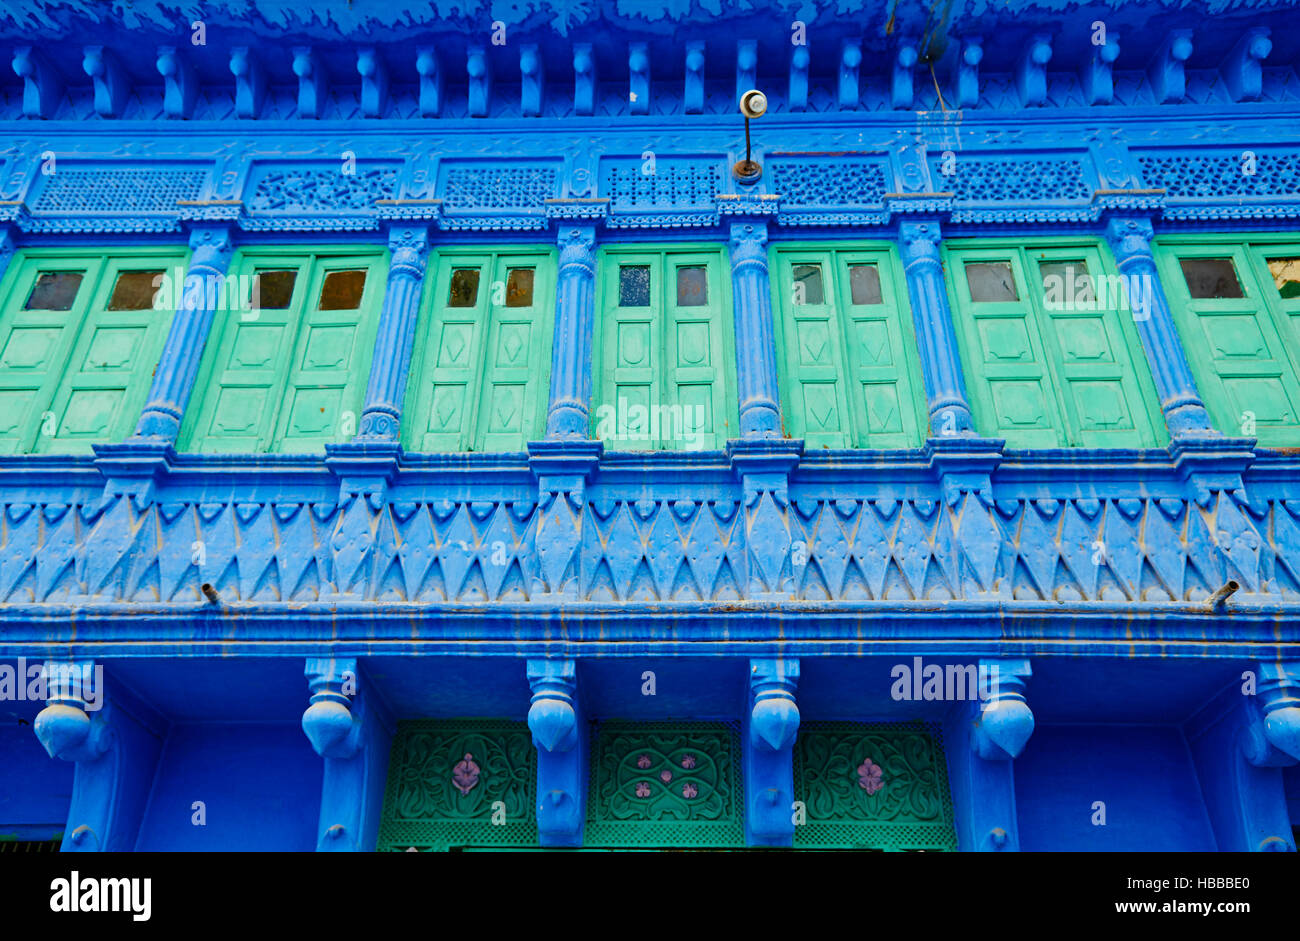 Inde, Rajasthan, Jodhpur la ville bleue // India, Rajasthan, Jodhpur the blue city - Stock Image